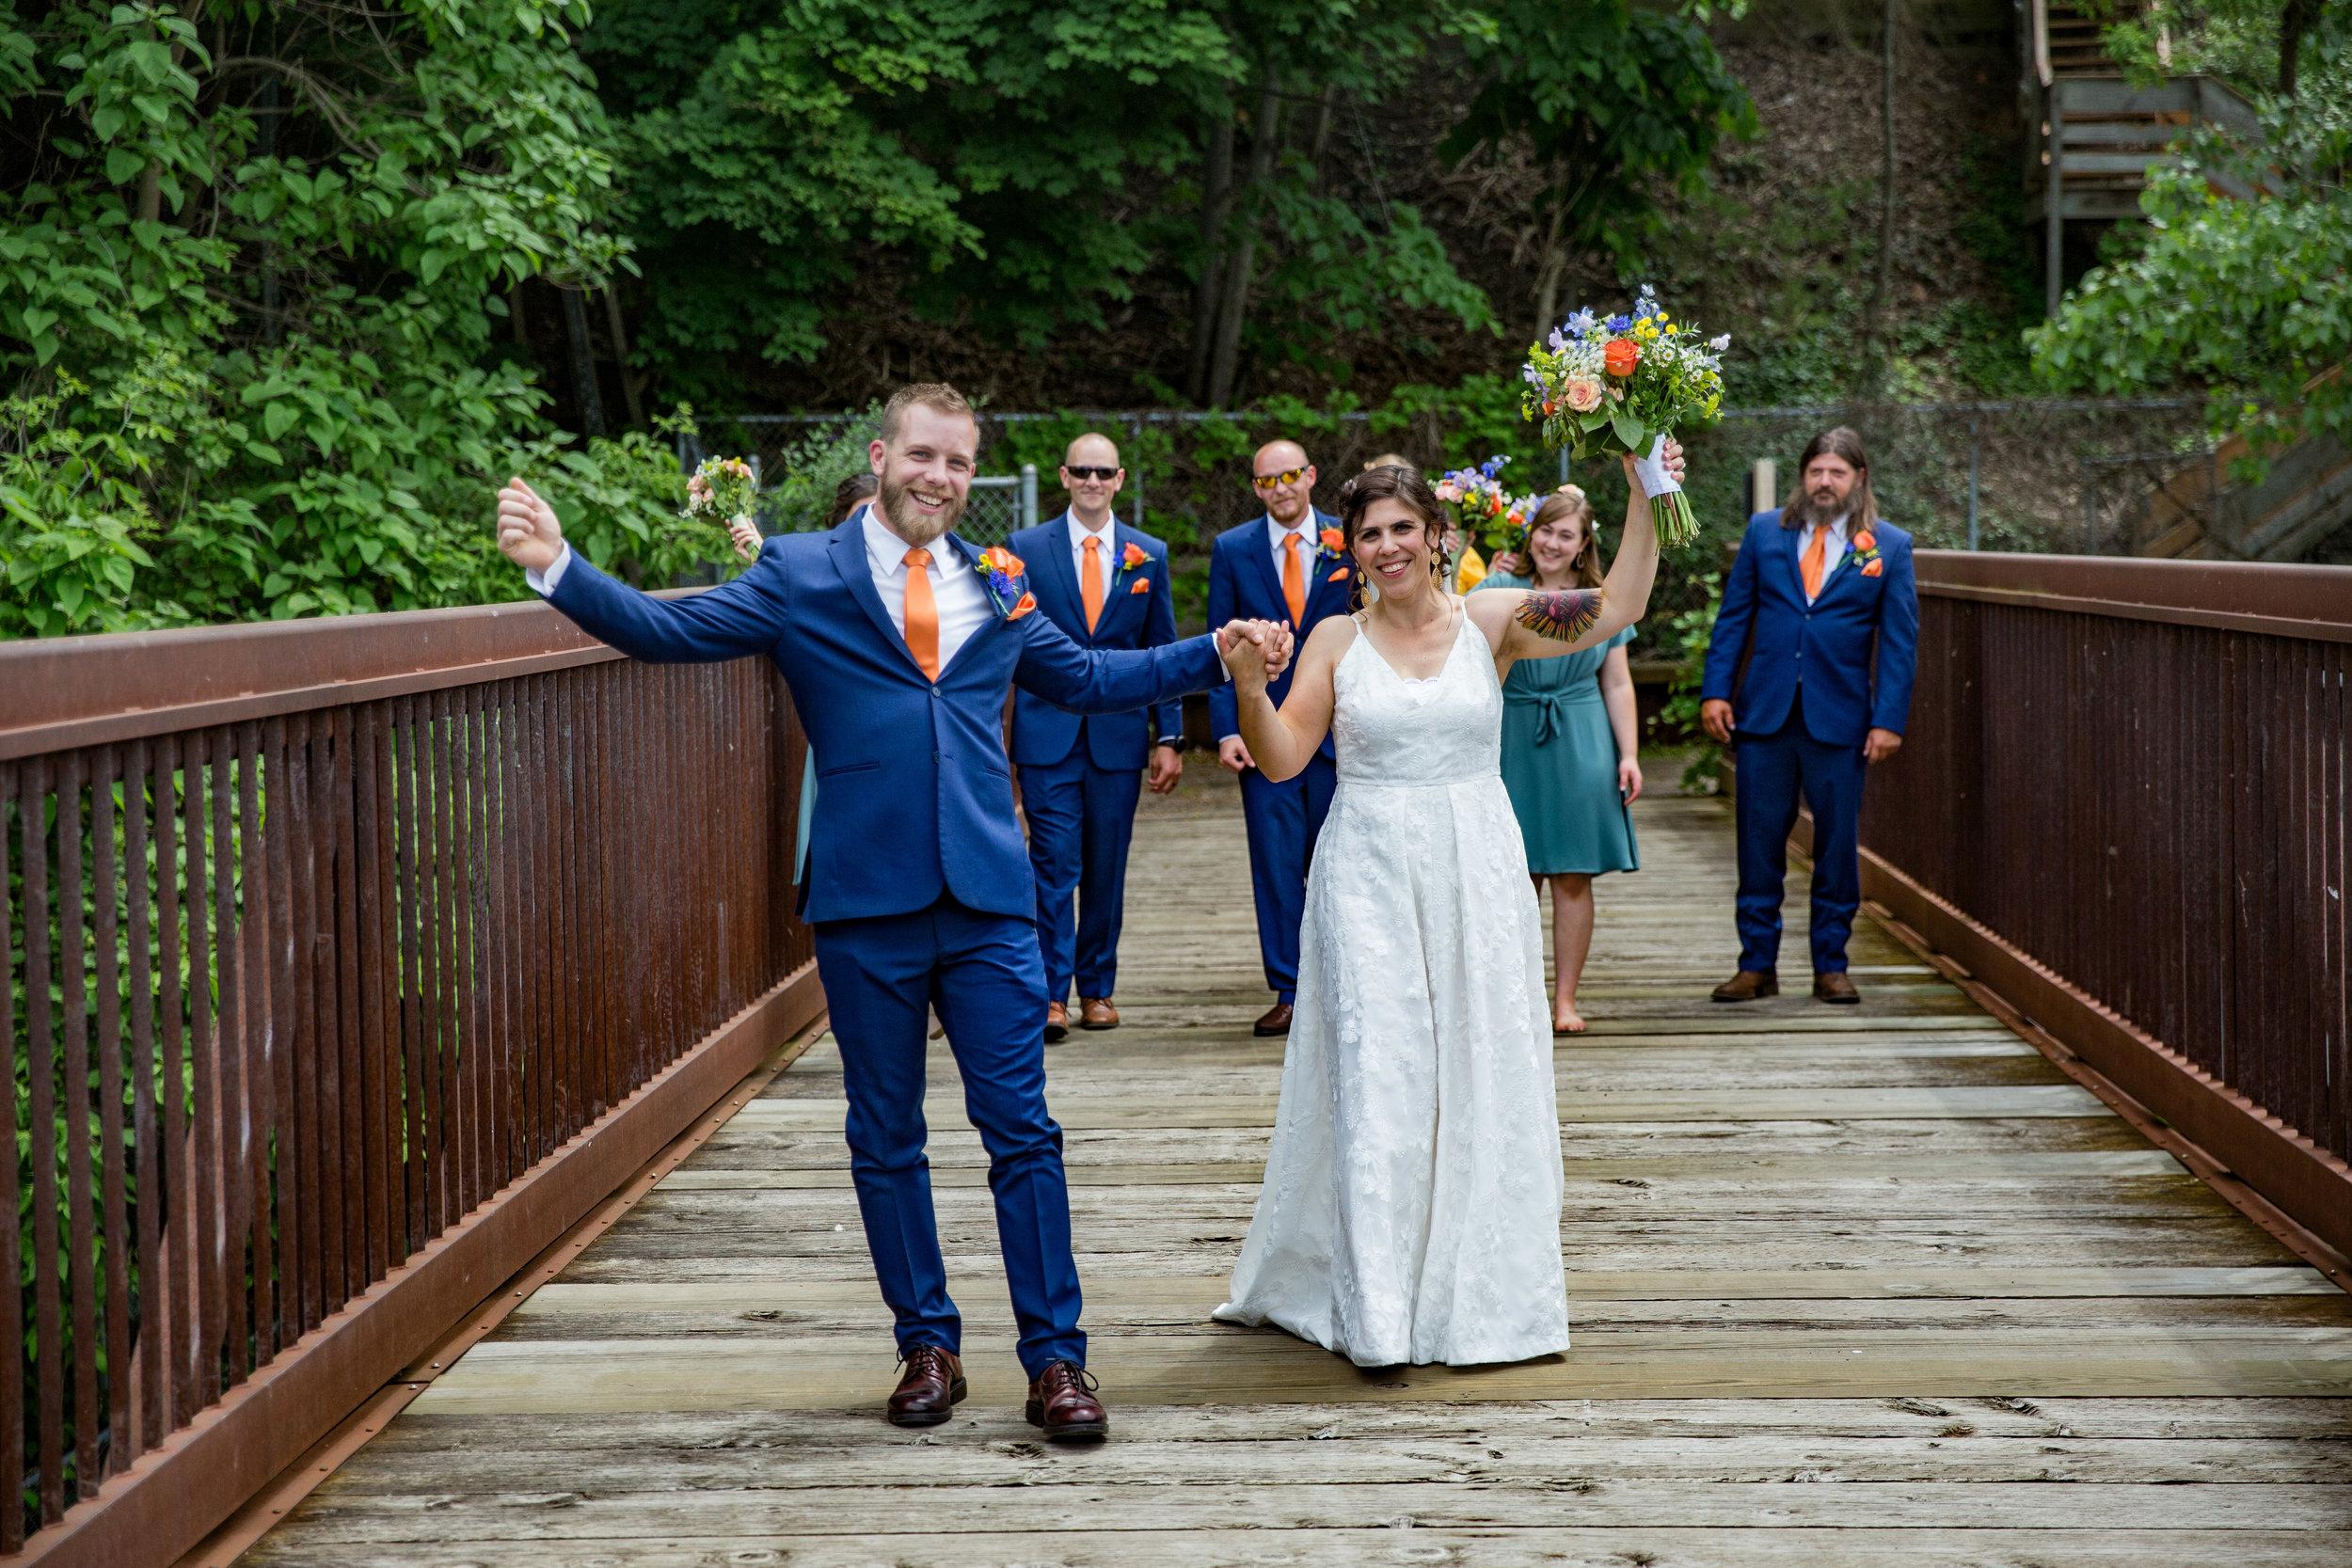 Natalie and Dallas Mooney Wedding 6-8-19_Tania Watt Photography-246.jpg